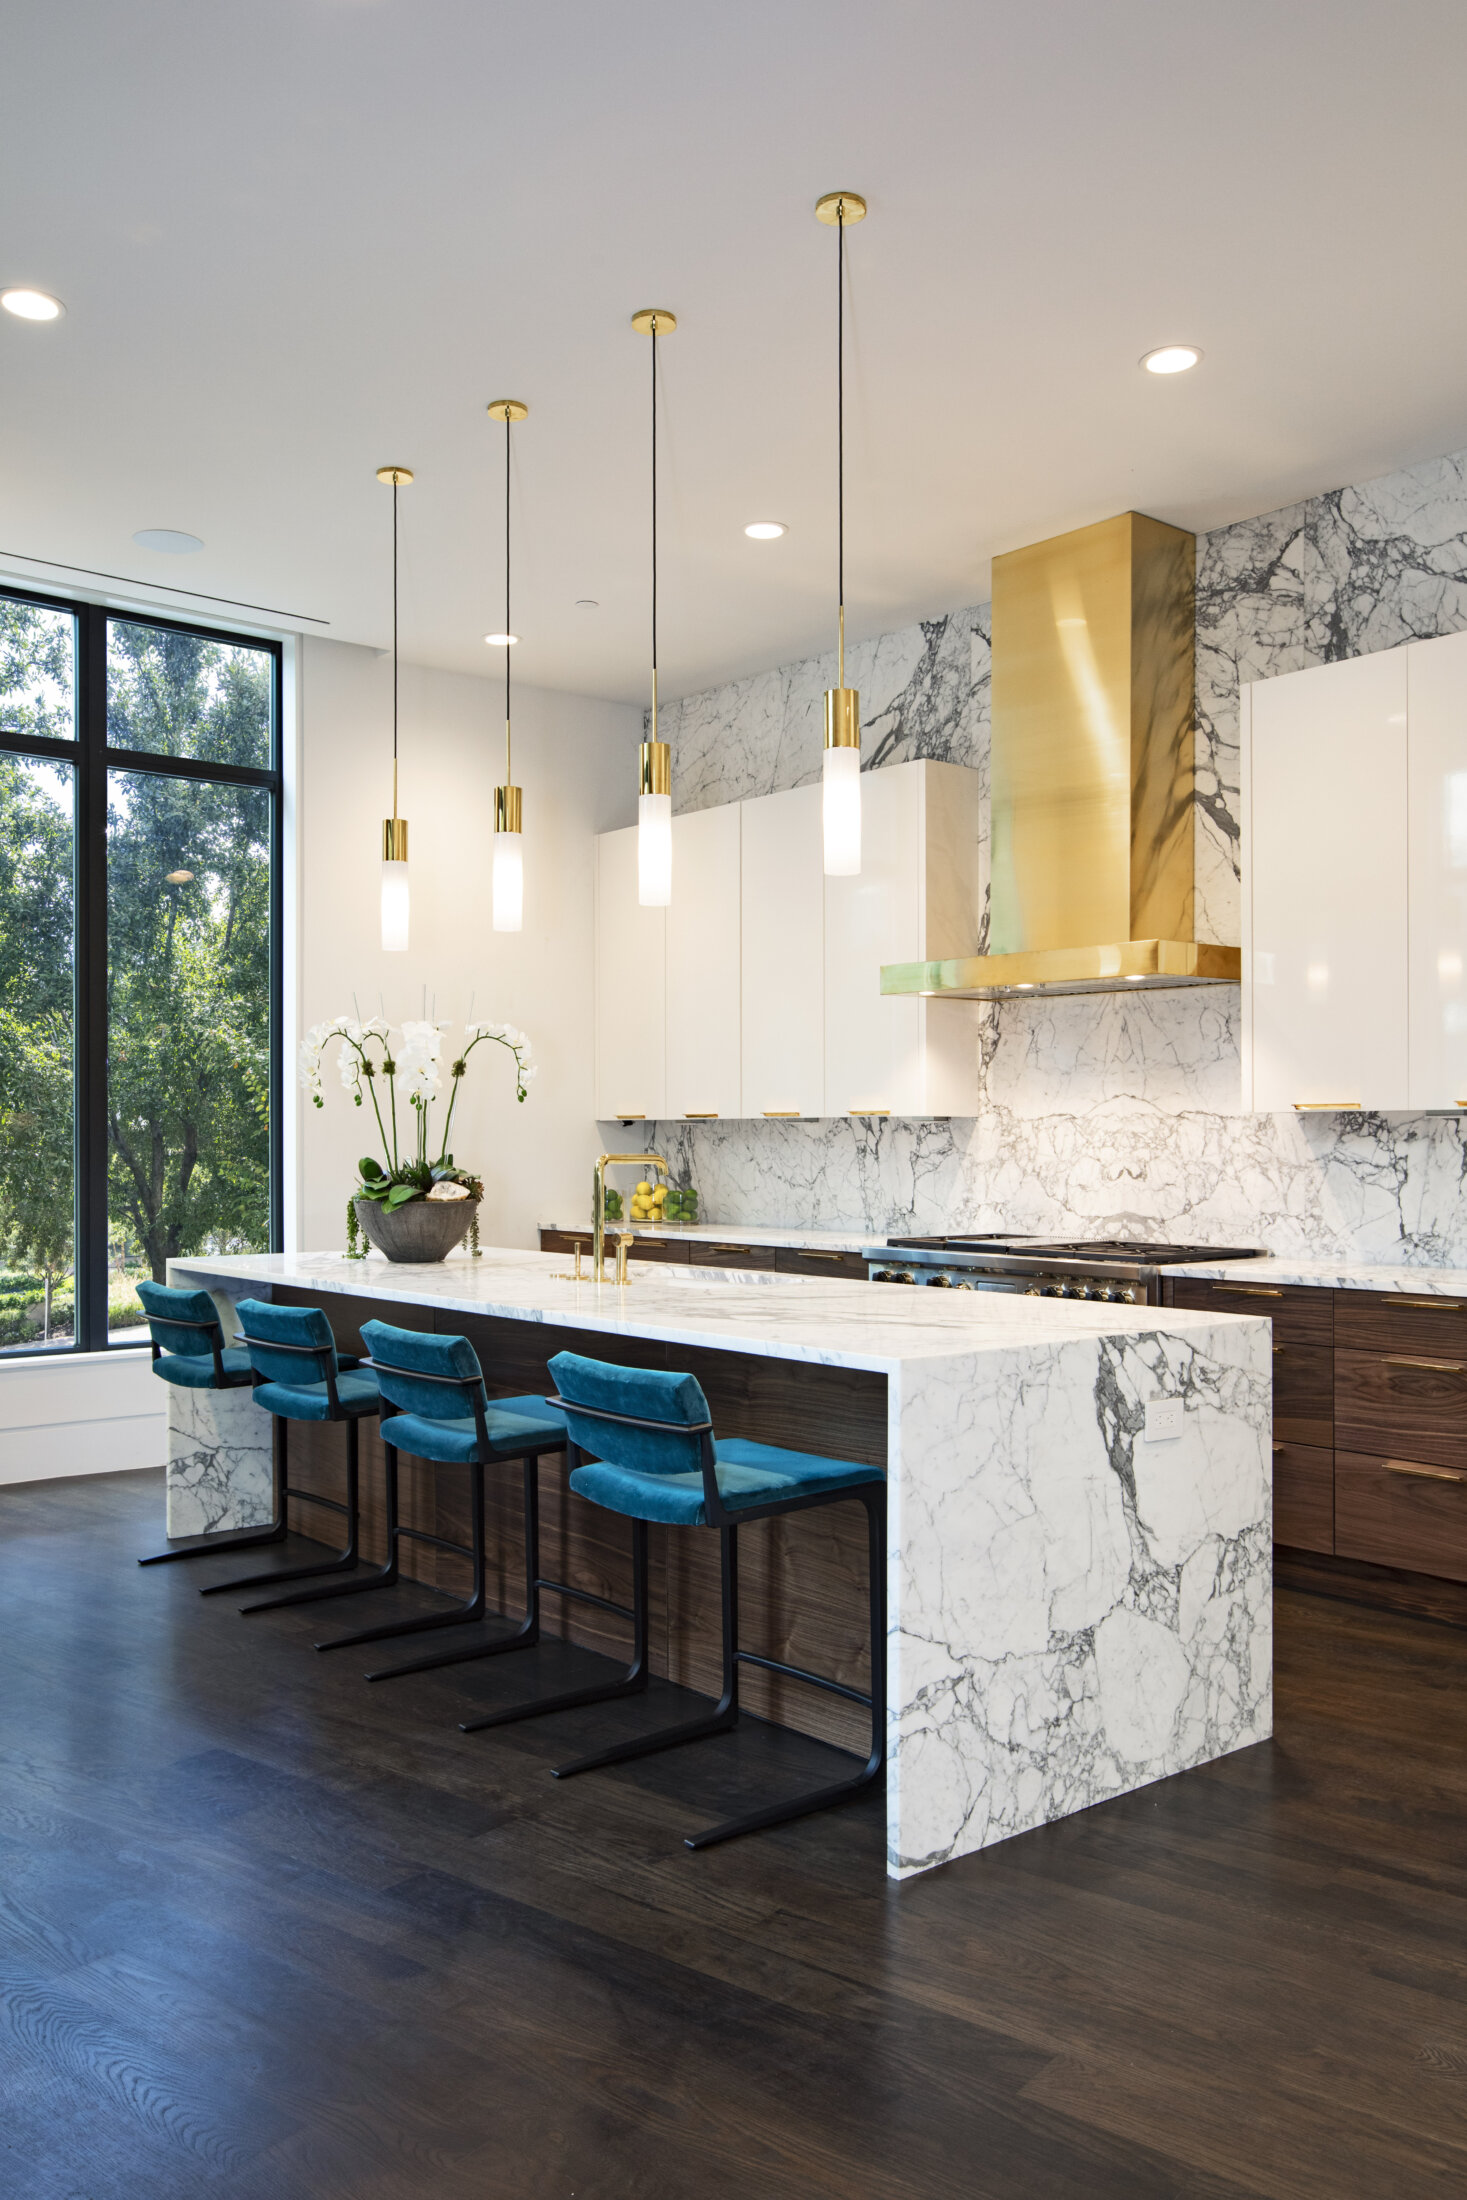 Kitchens - Platinum Homes Mark Molthan